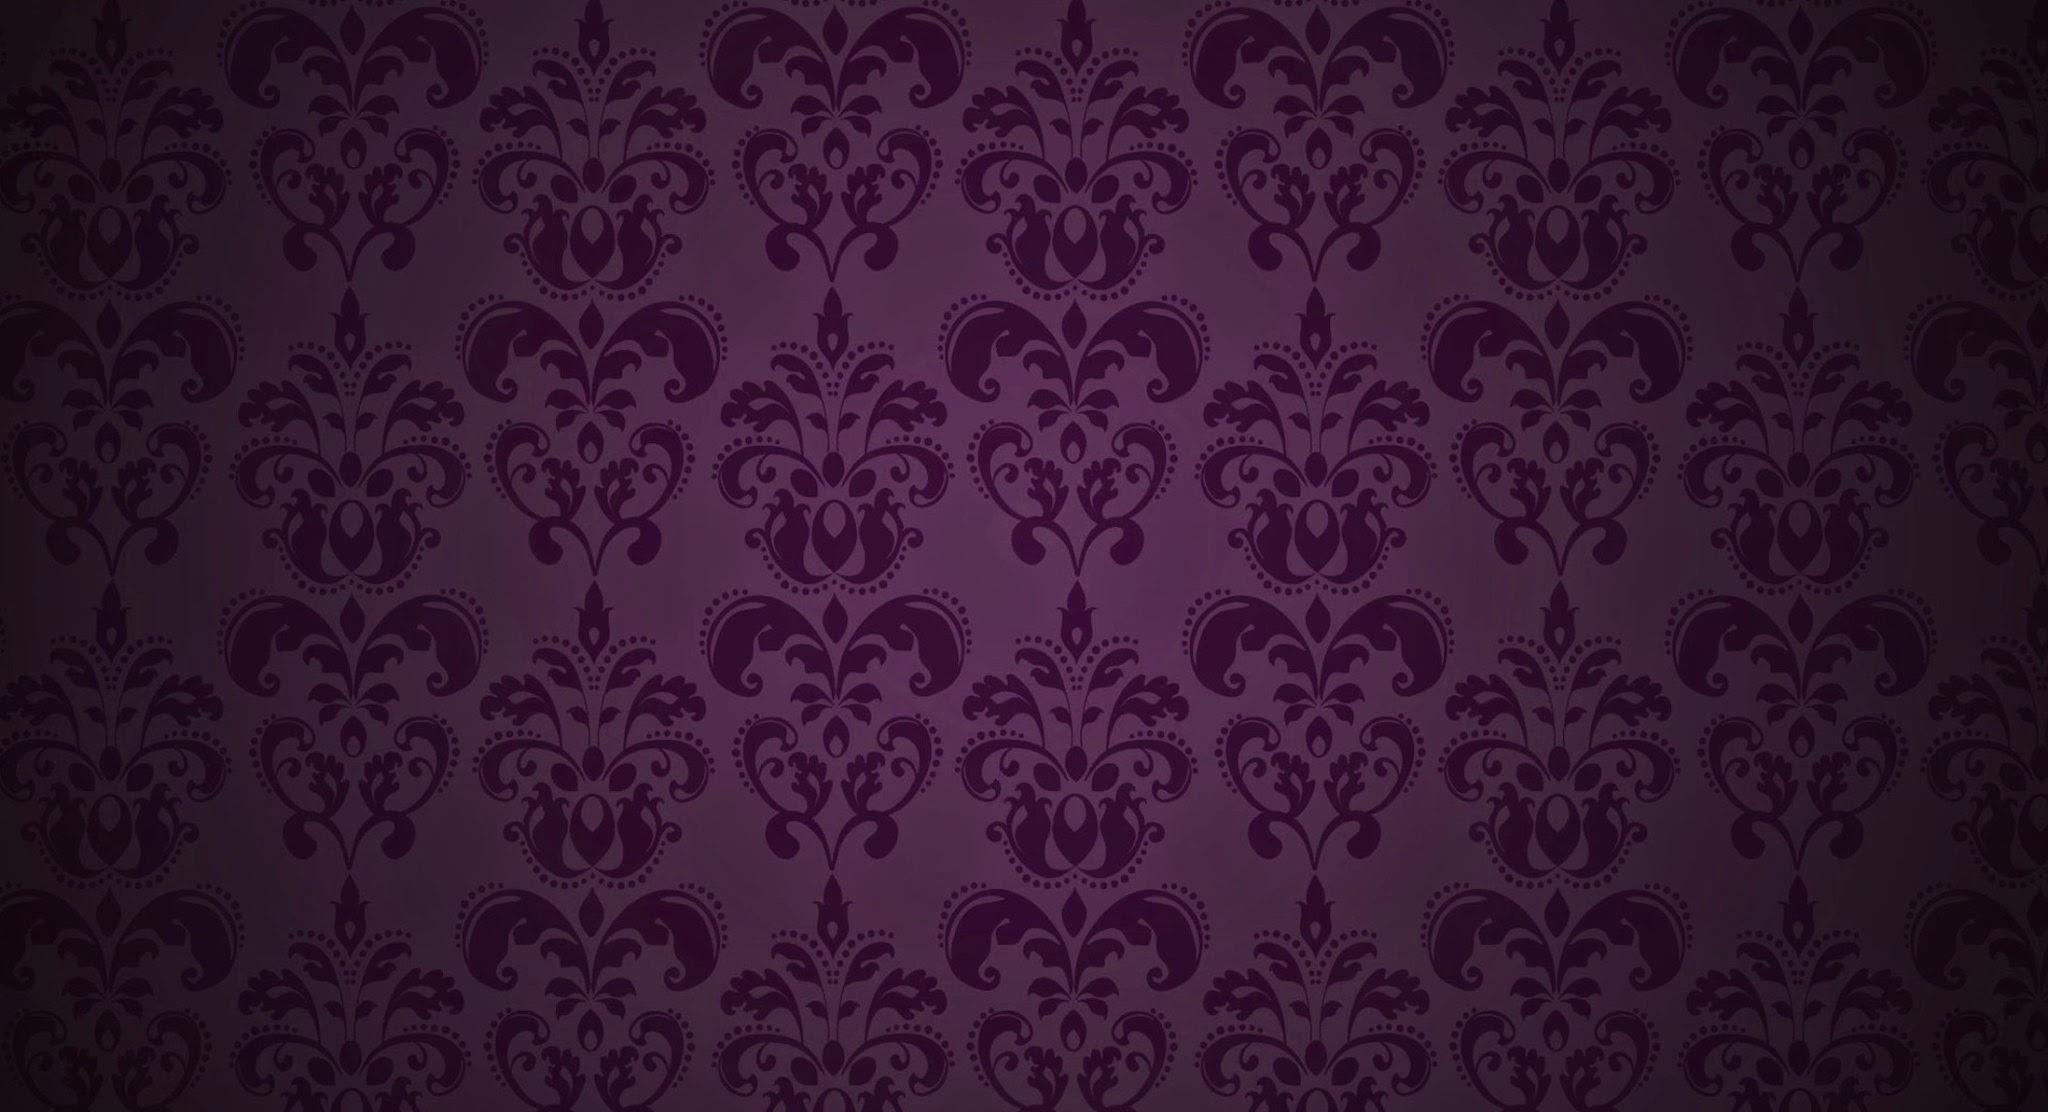 Purple Twitter Backgrounds  WallpaperSafari